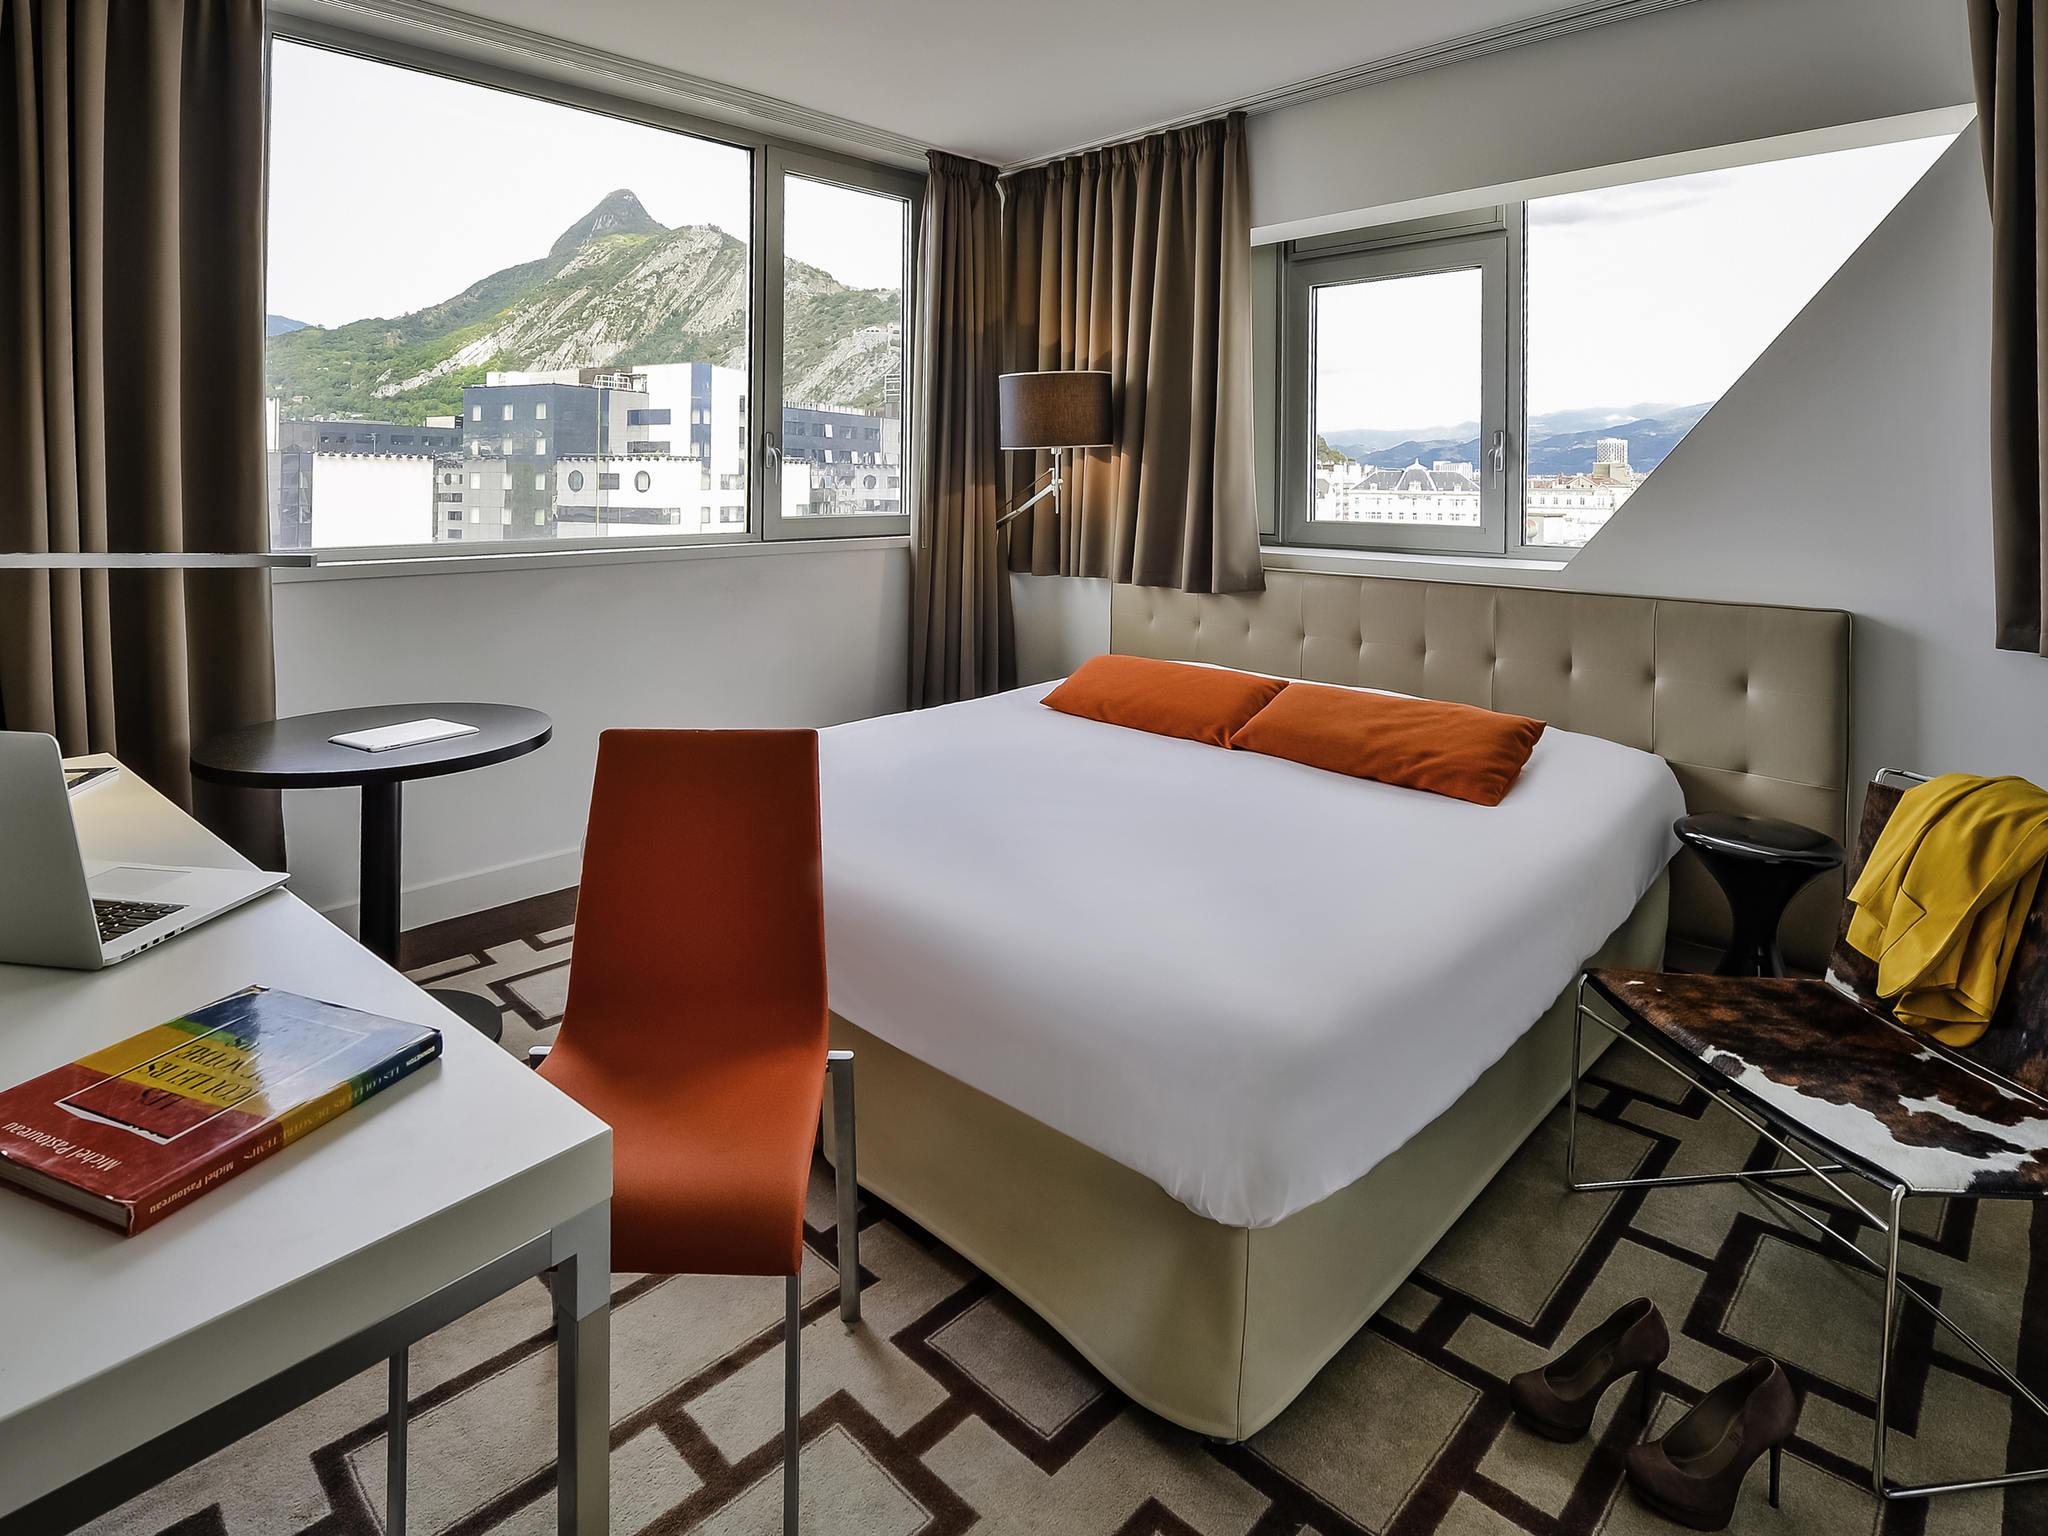 Hotel – Hipark by Adagio Grenoble